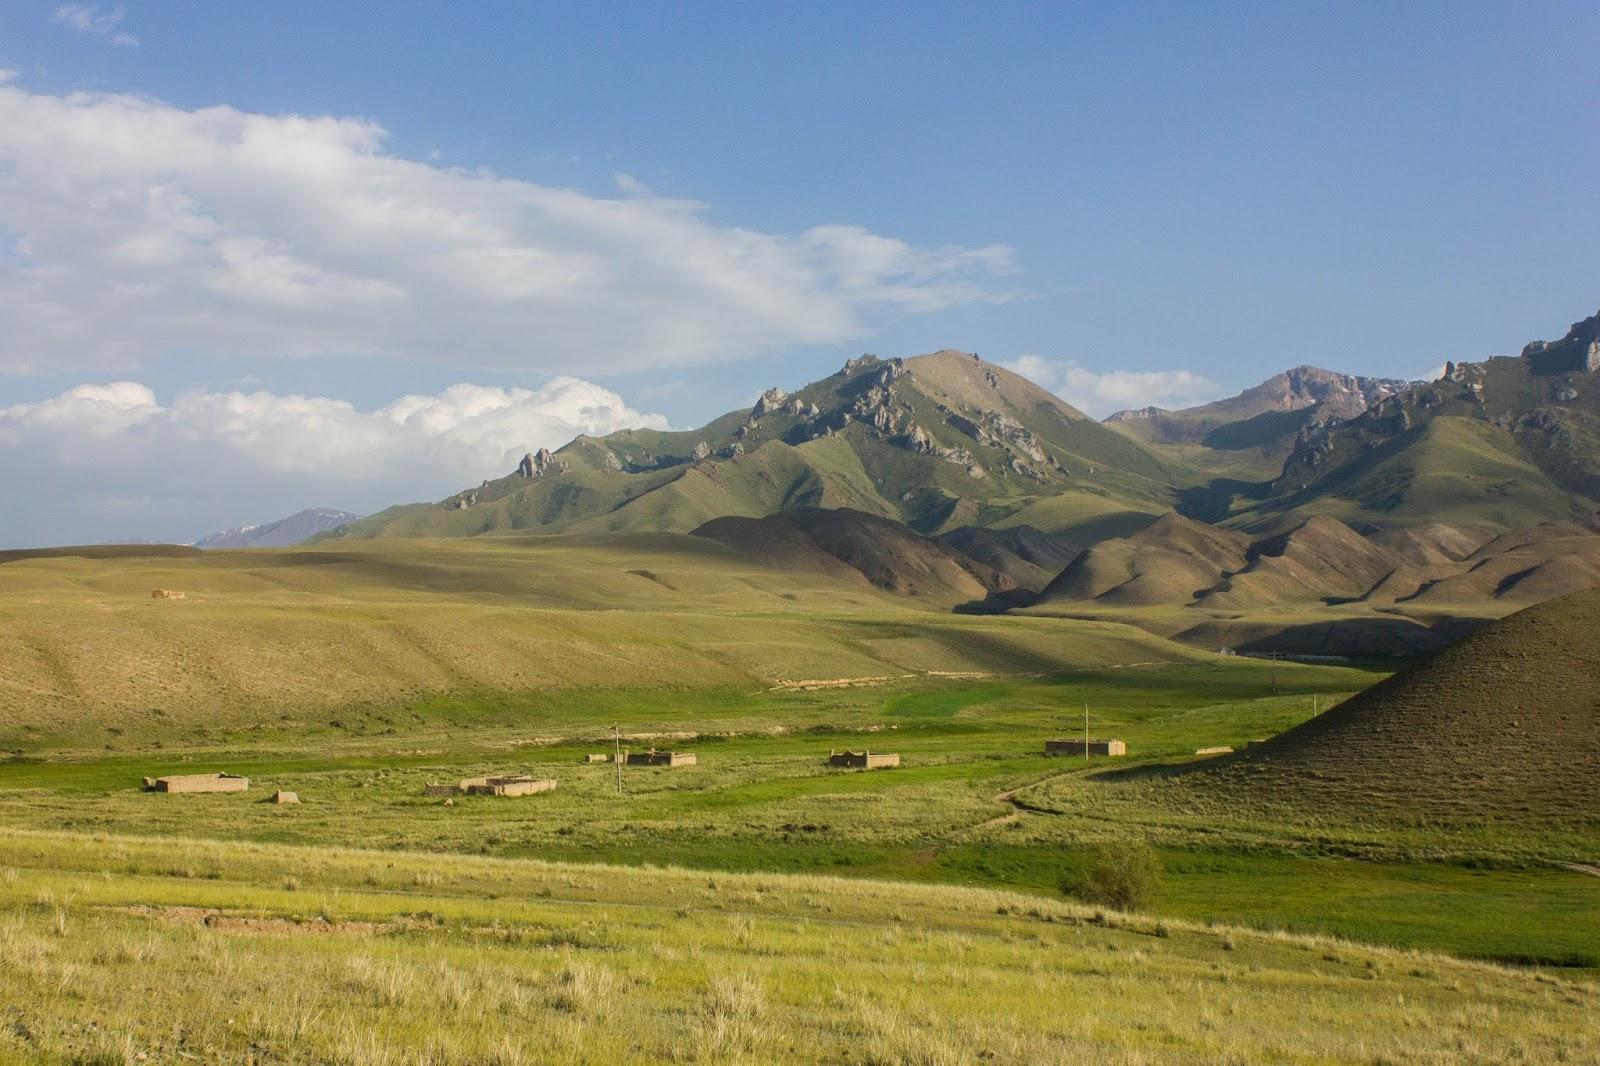 Кыргызские горы, Кыргызстан, Нарынская область